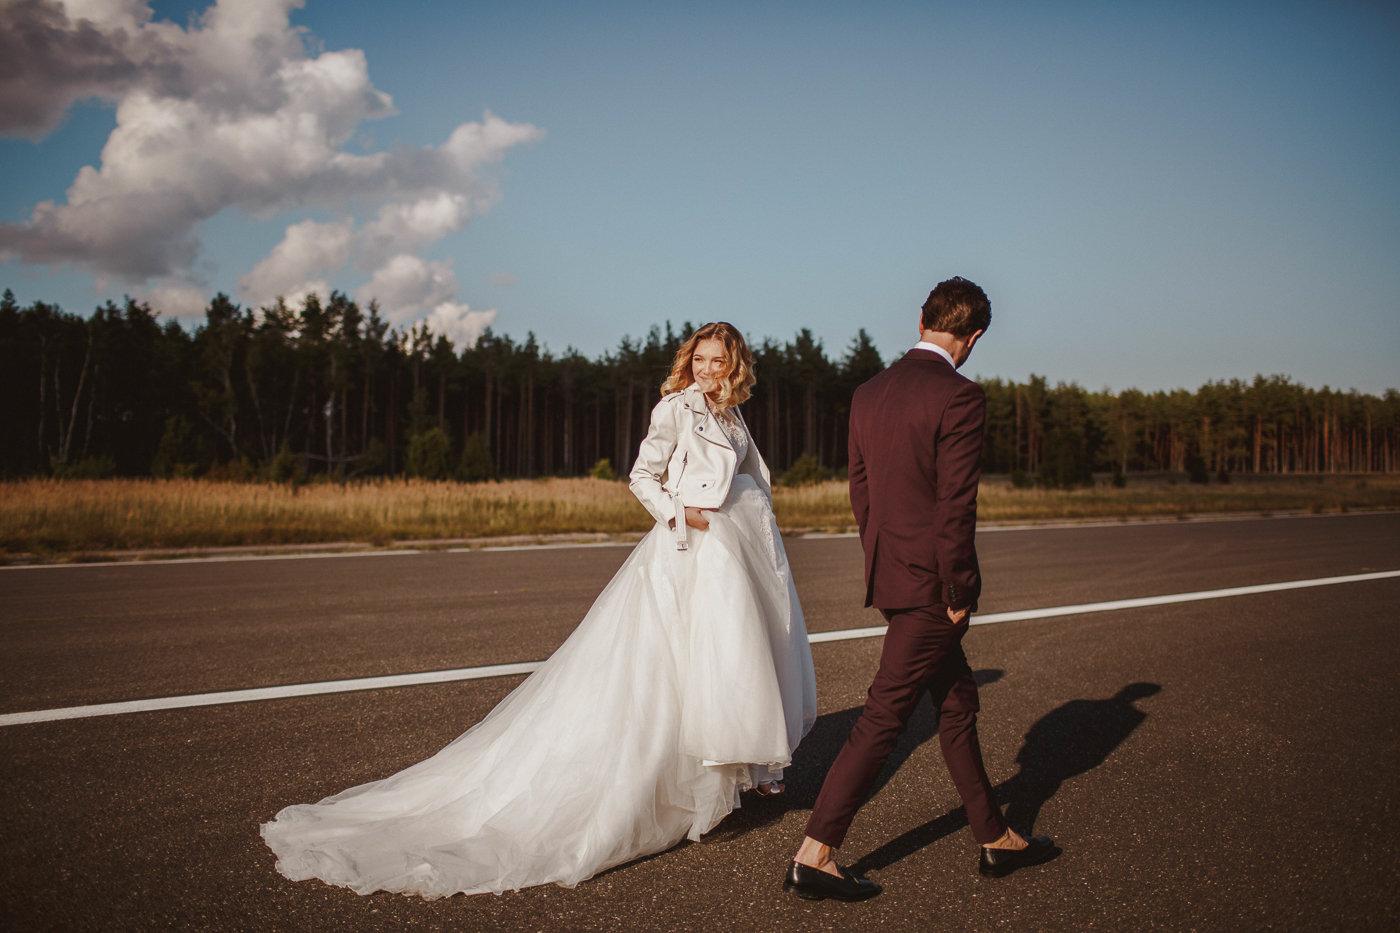 destination-wedding-photography-36.jpg